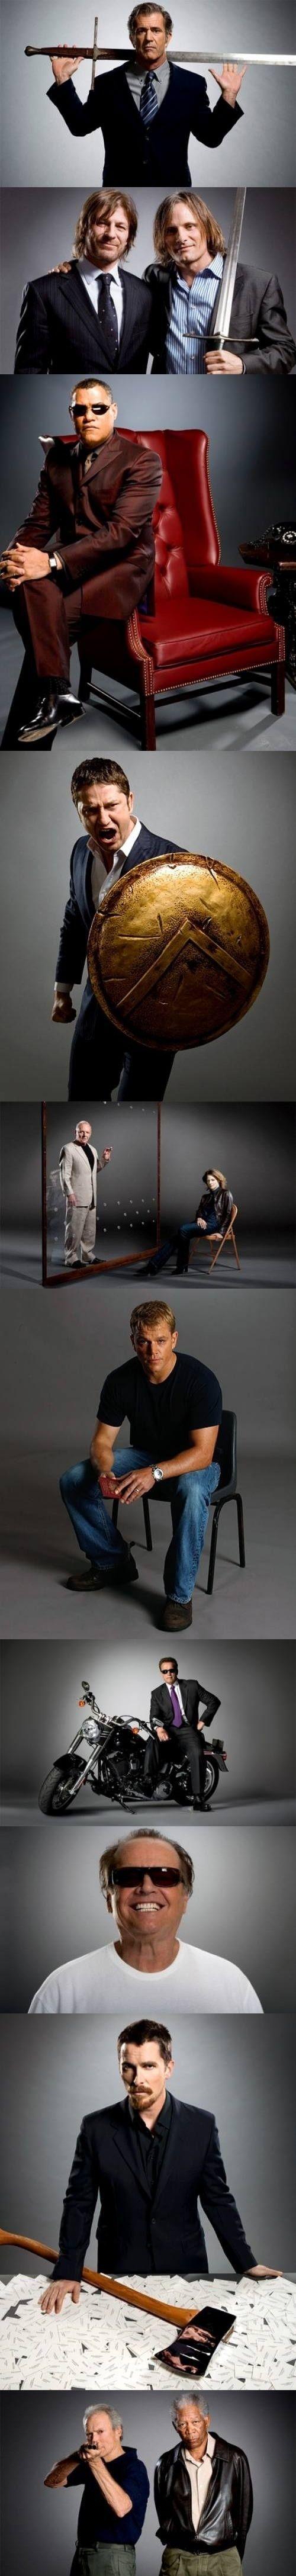 Famous actors recreating iconic roles